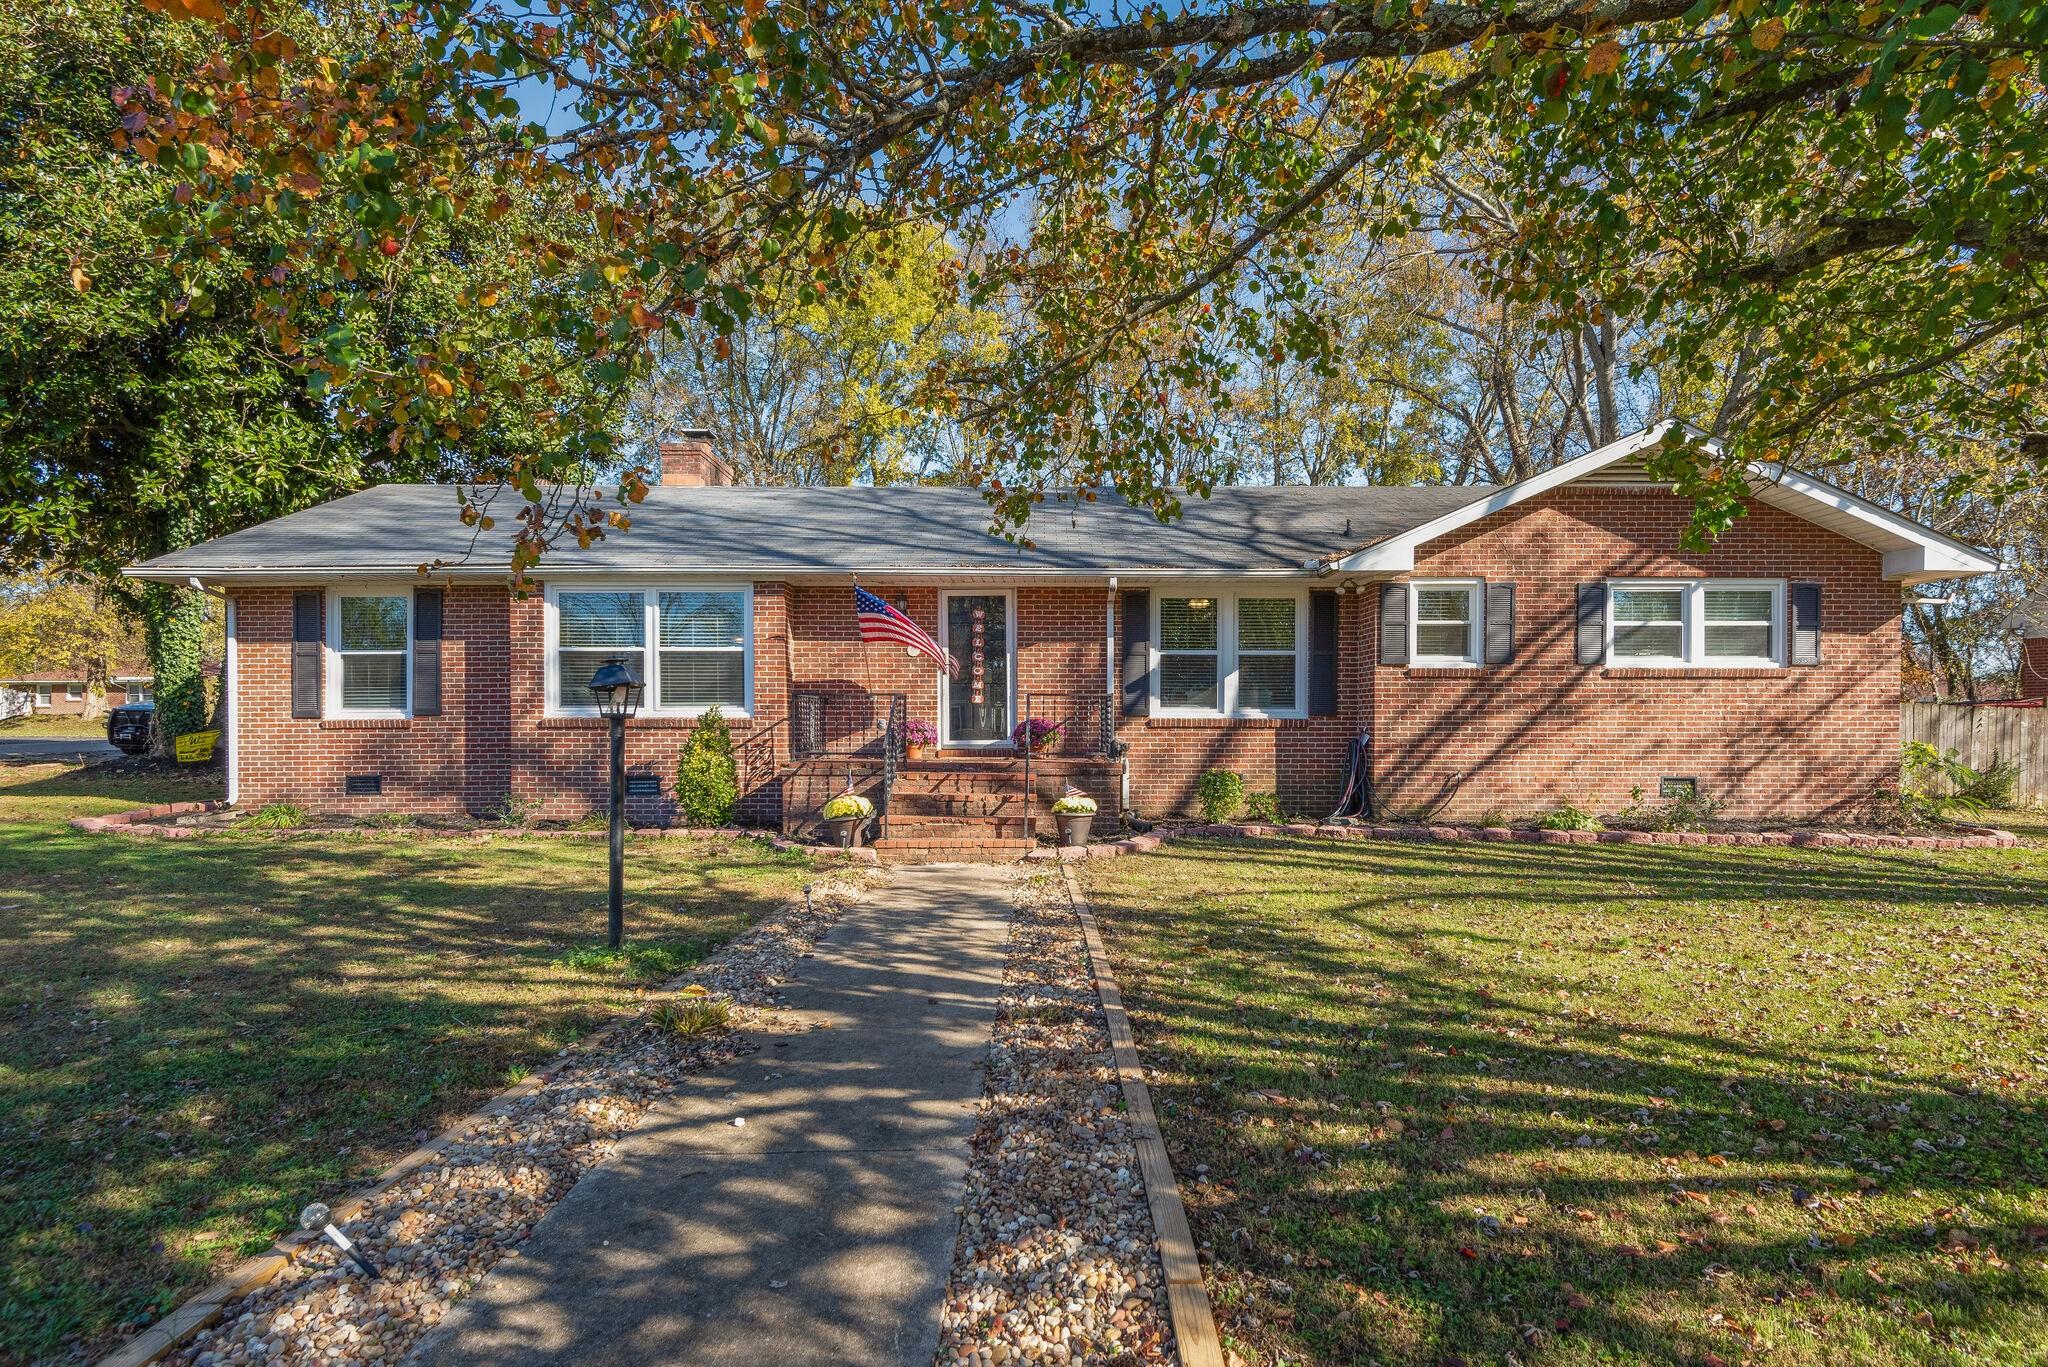 1203 Glaze Court Property Photo - Murfreesboro, TN real estate listing